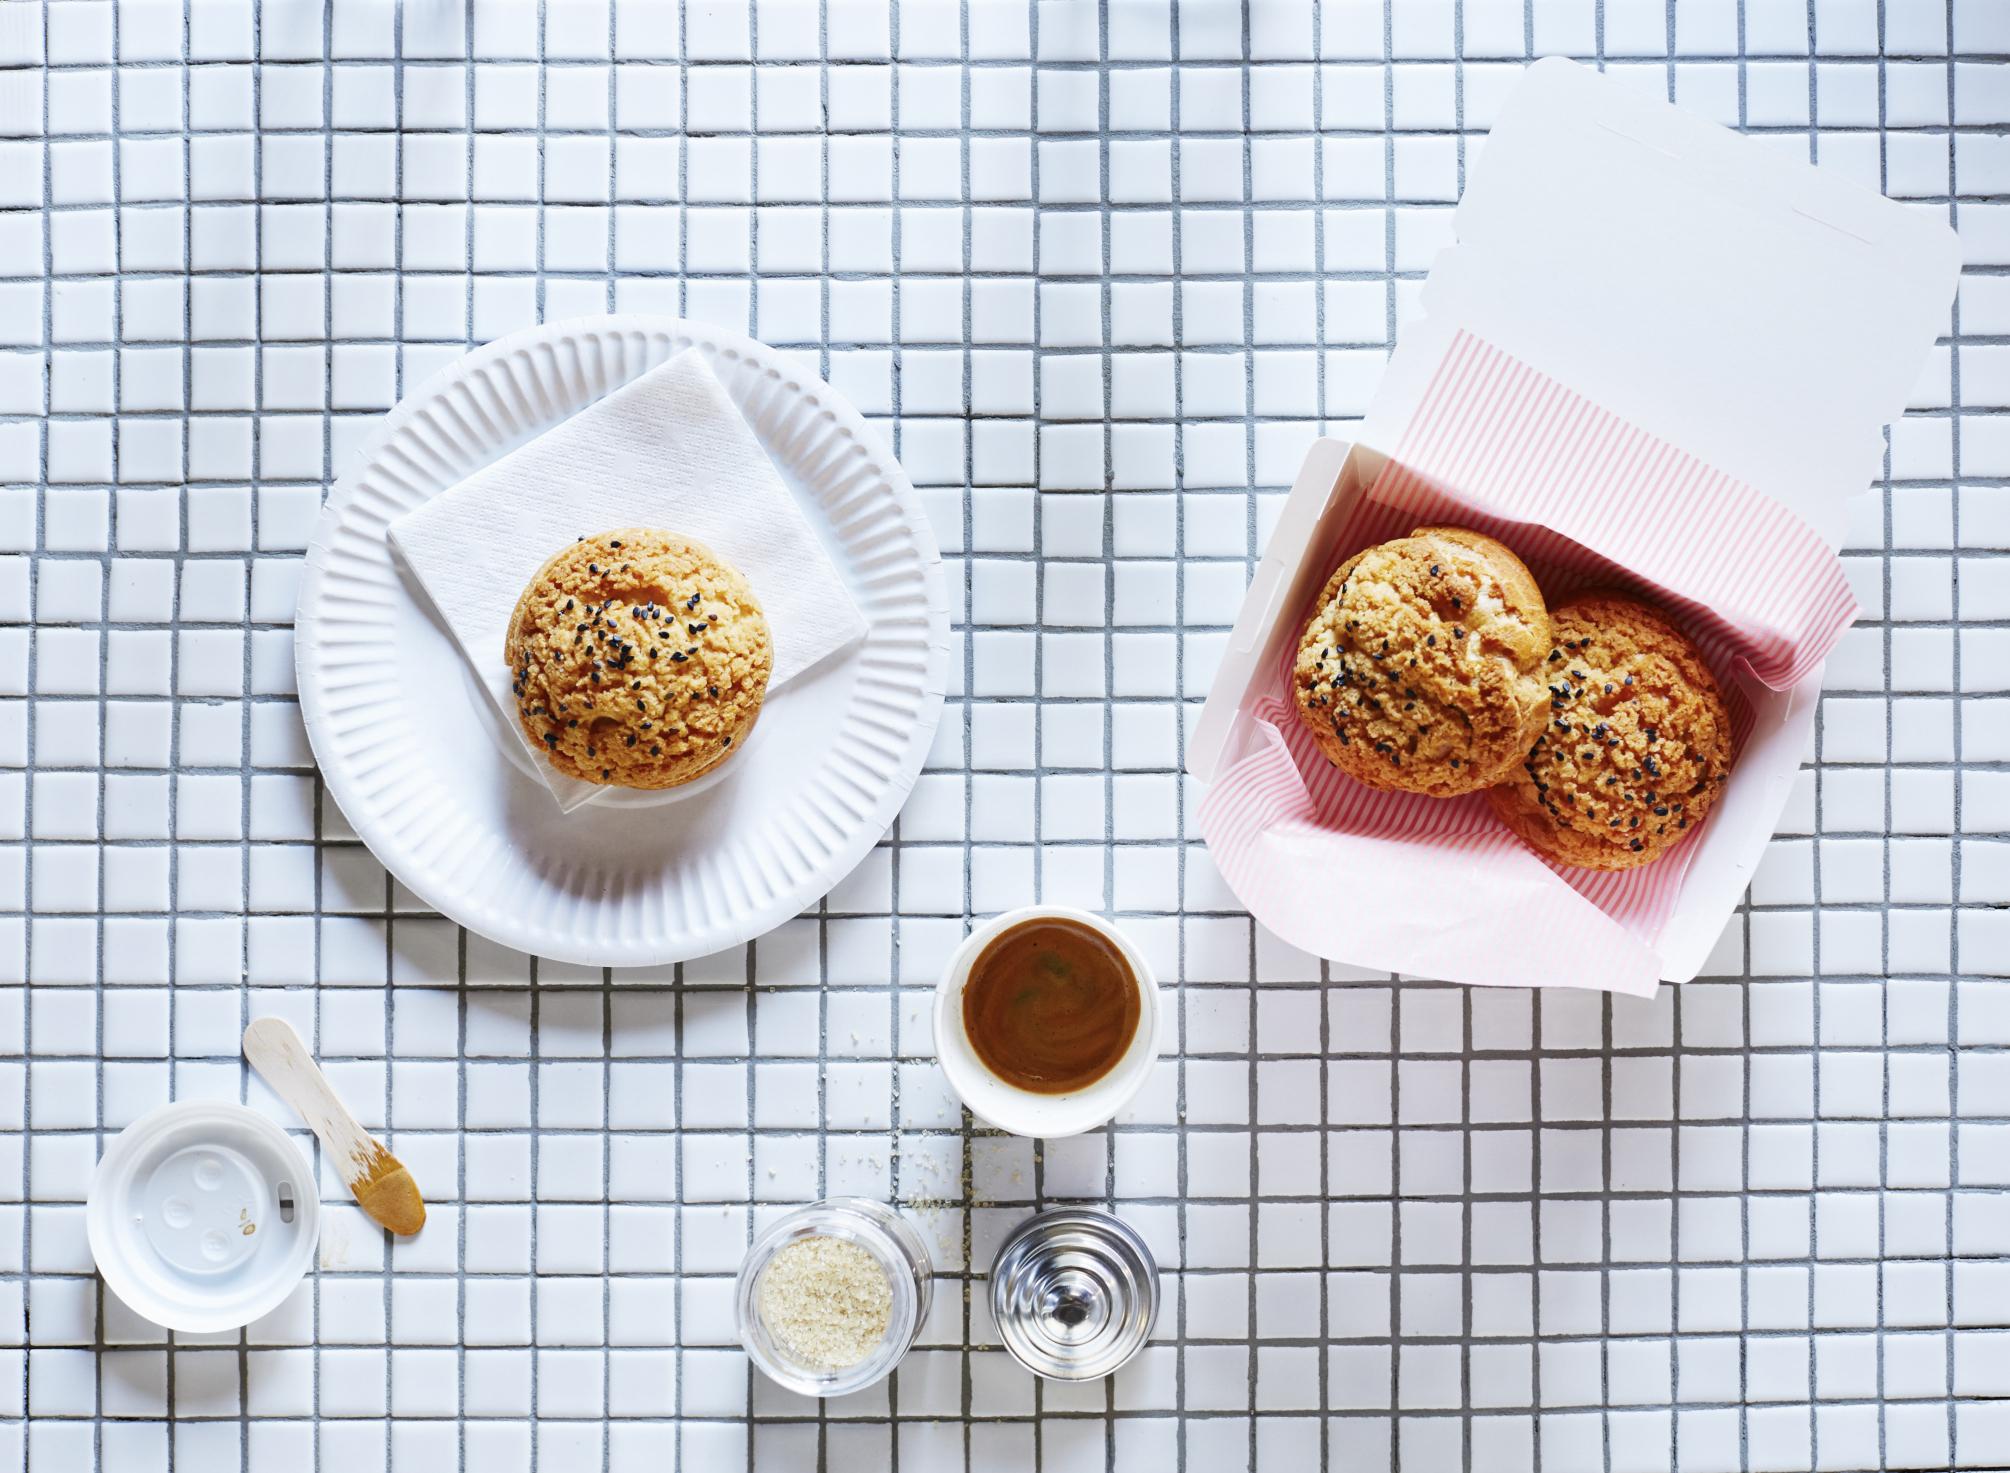 Black sesame cream puffs recipe, The Desserts of New York. Photo: Alicia Taylor.